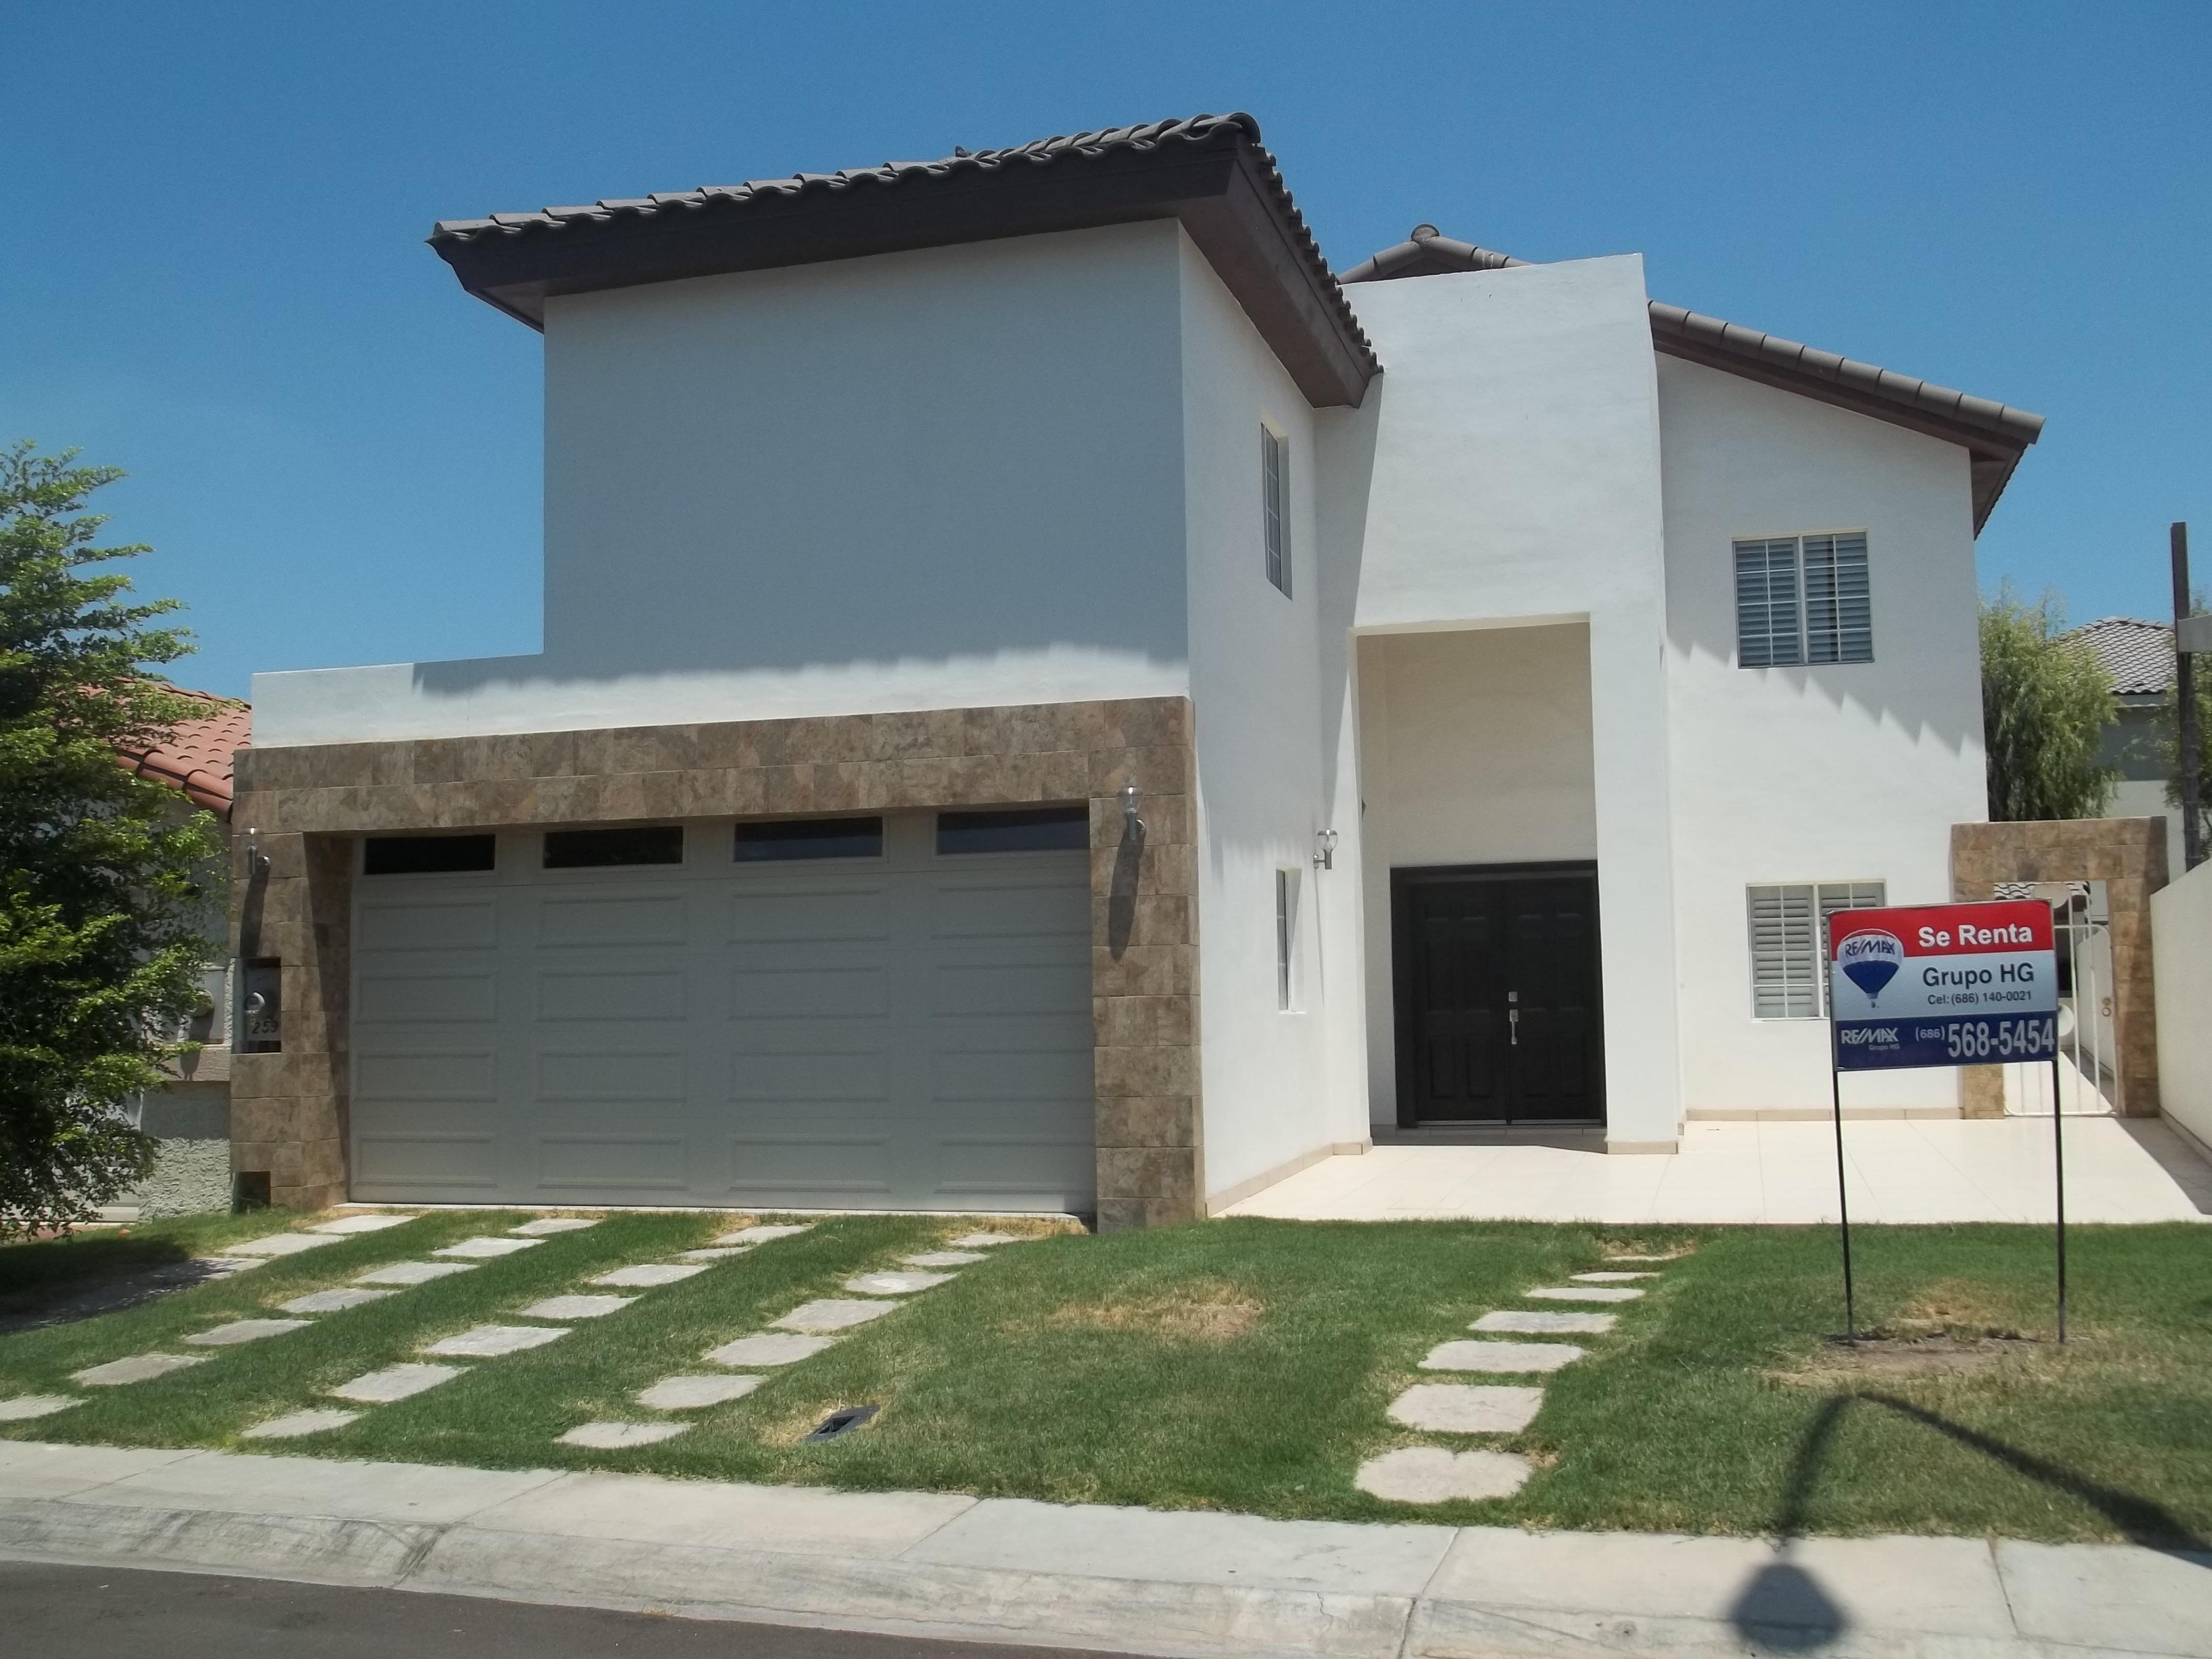 Renta de casa en villa bonita mexicali goplaceit for Renta de casas en mexicali